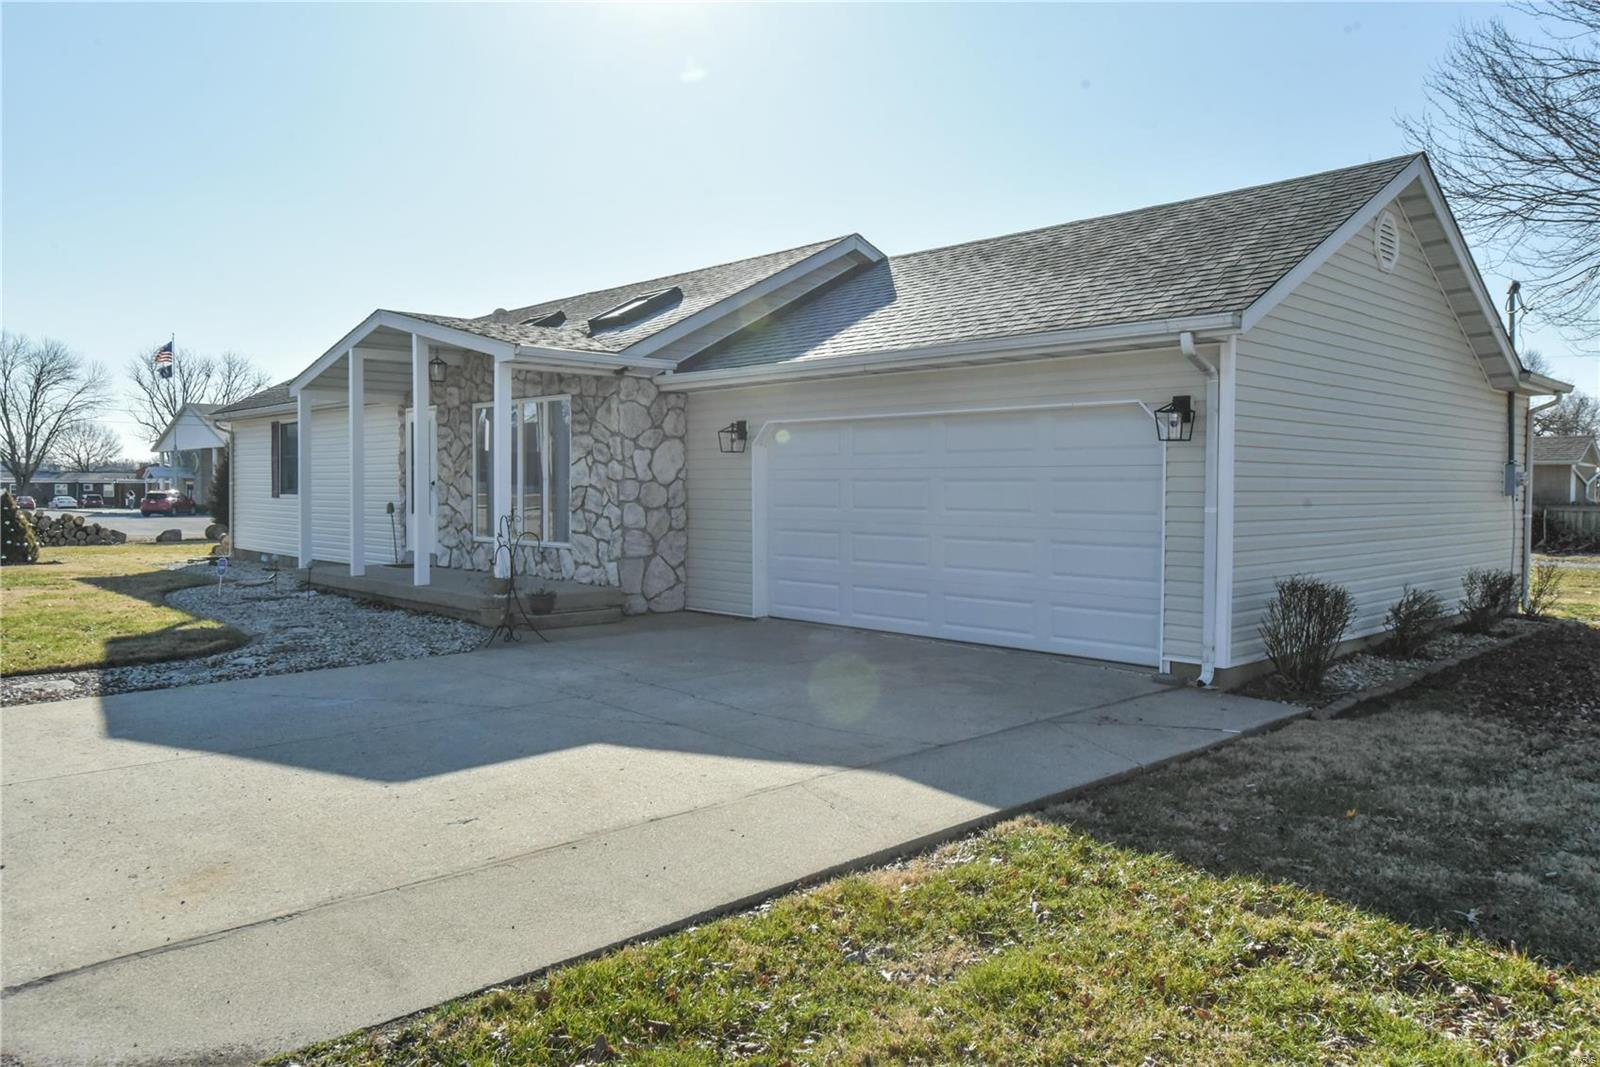 7 E Illinois Street Property Photo - New Baden, IL real estate listing